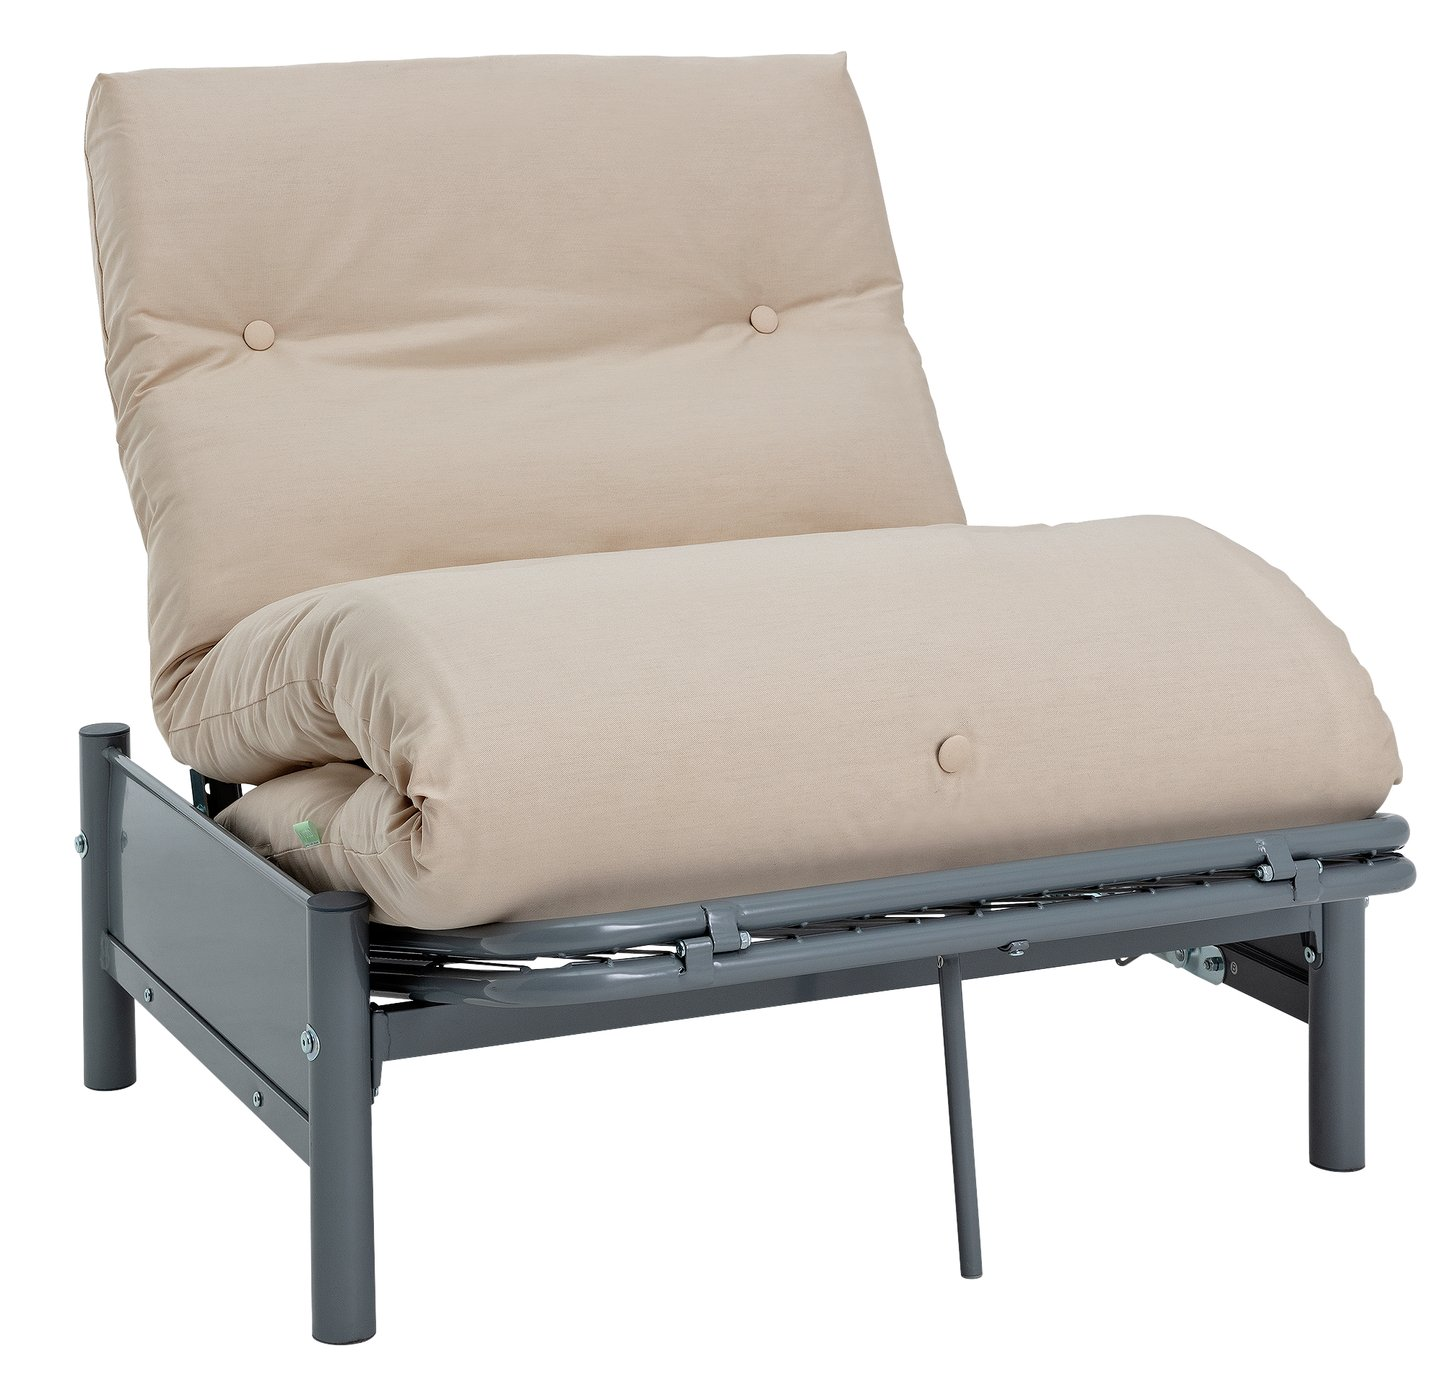 Argos Home Single Futon Metal Sofa Bed w/ Mattress - Natural